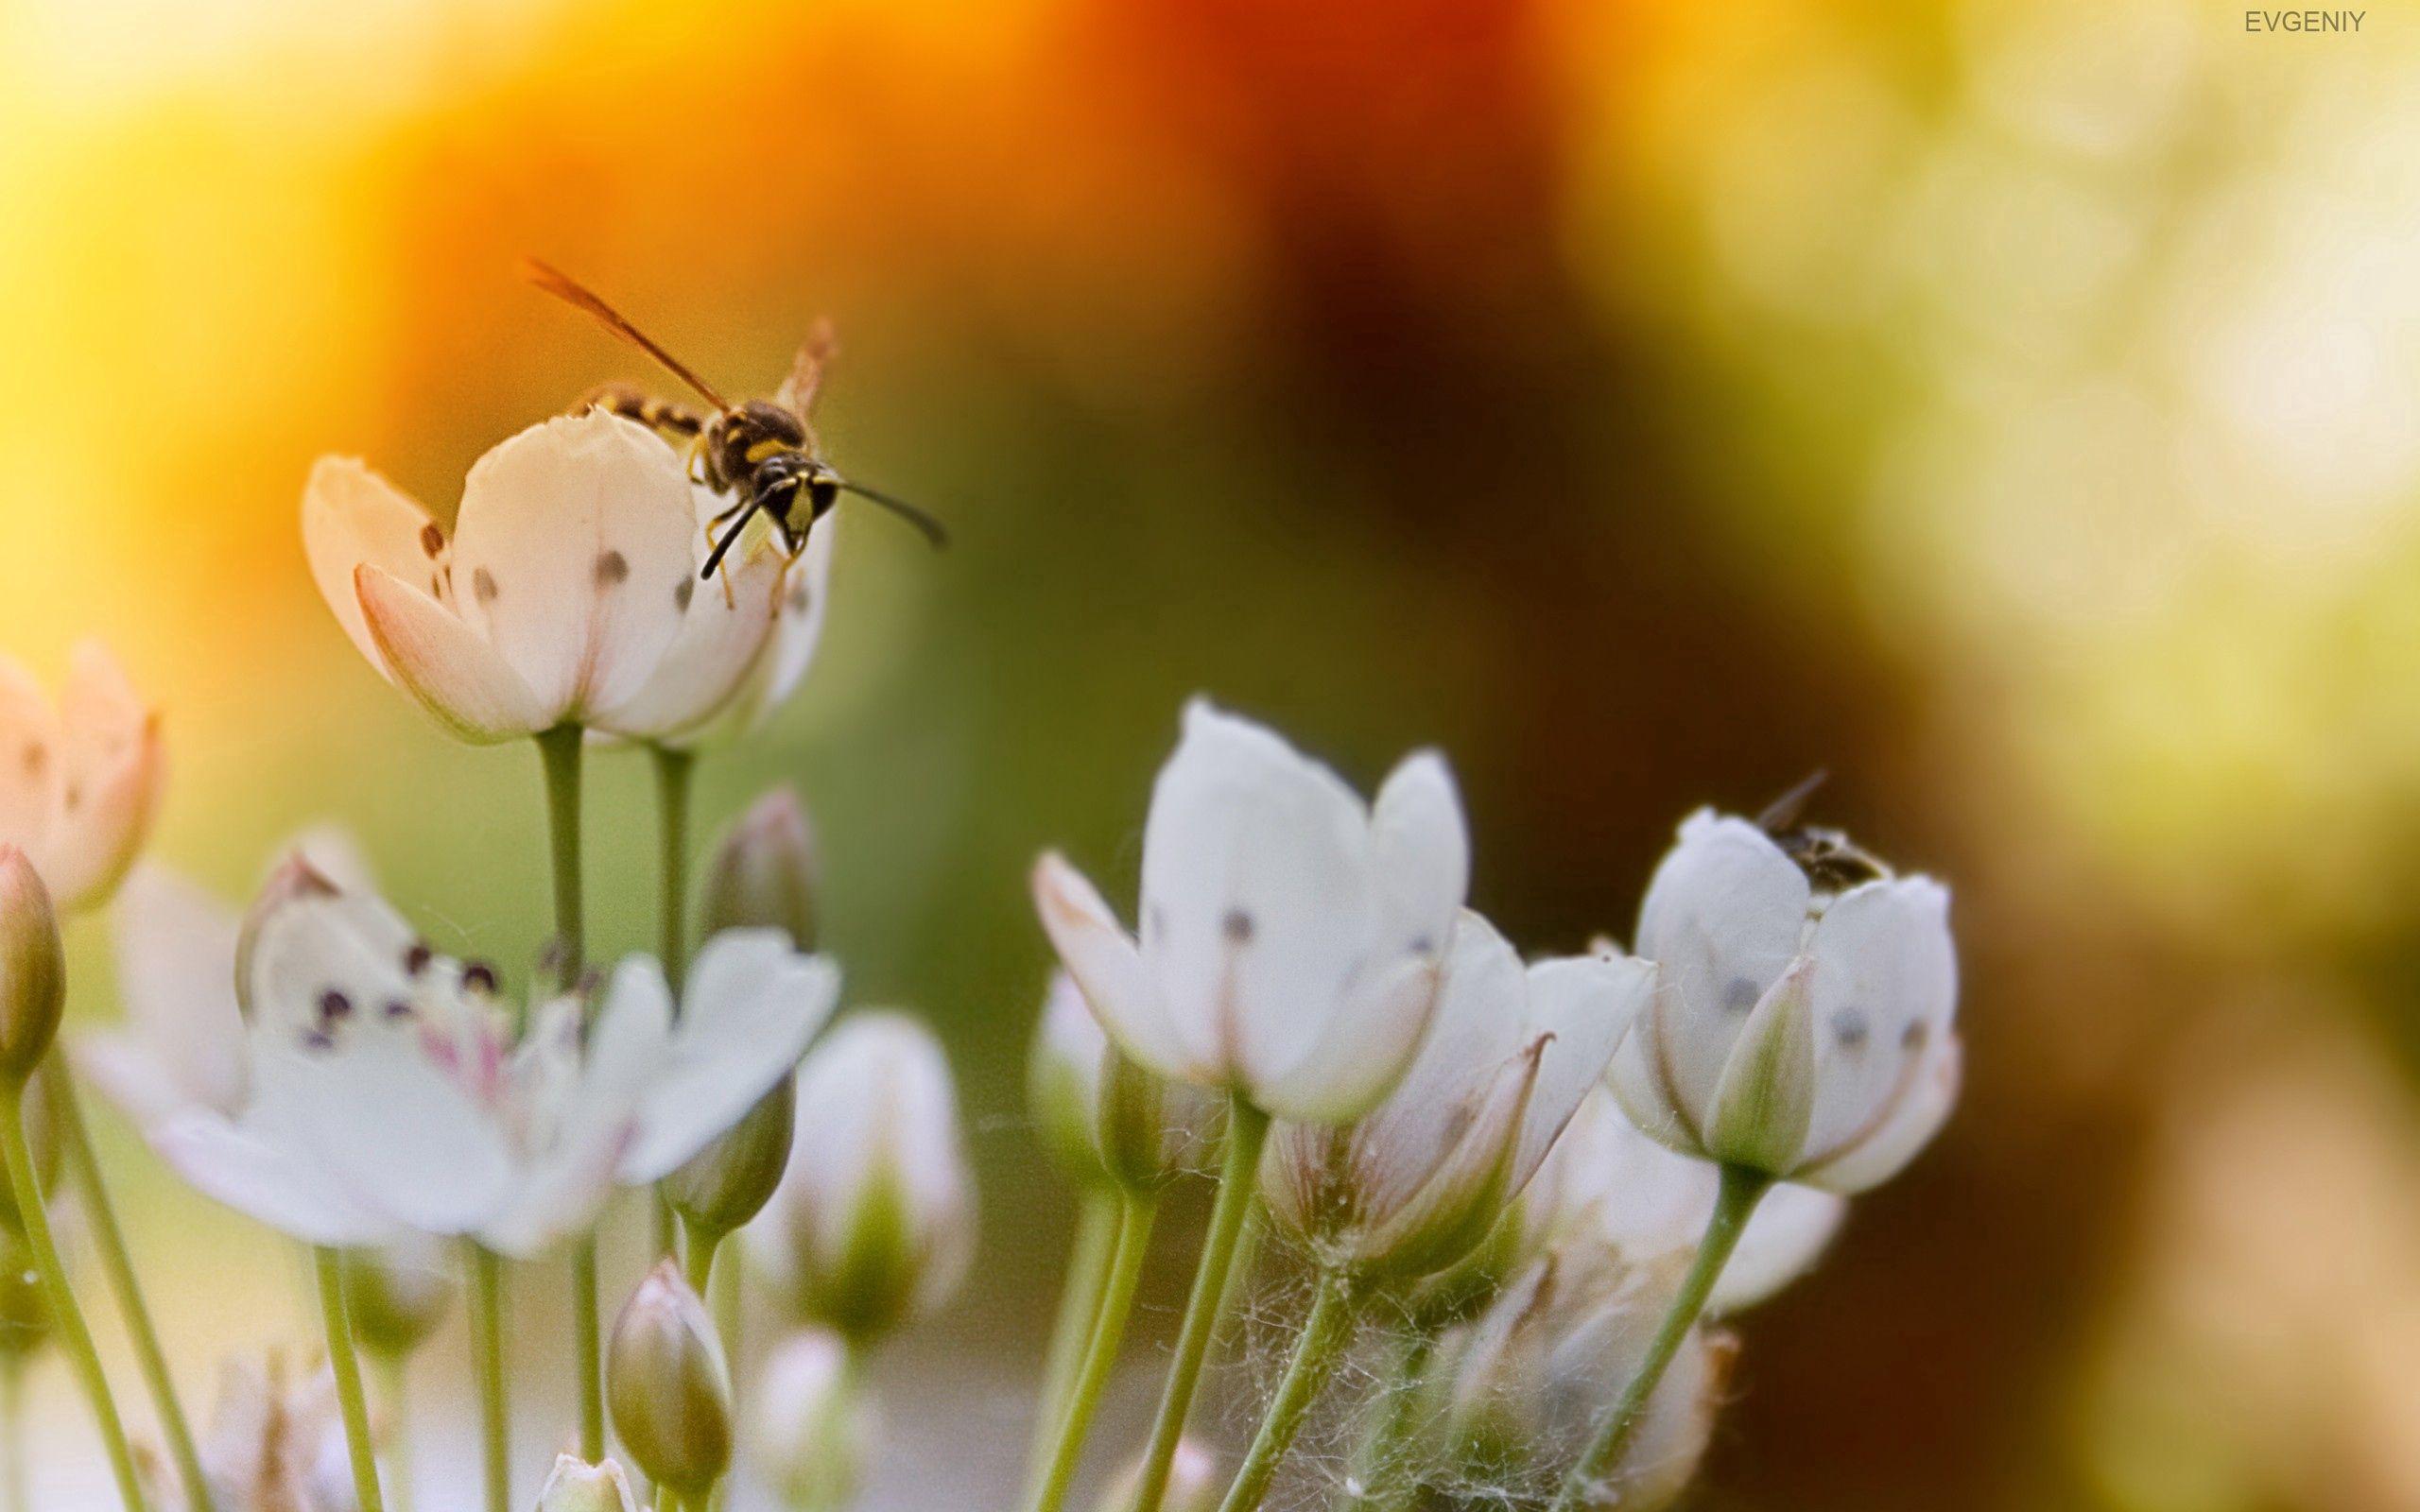 102777 descargar fondo de pantalla Macro, Vuelo, Brillar, Luz, Sol, Flores, Insectos: protectores de pantalla e imágenes gratis